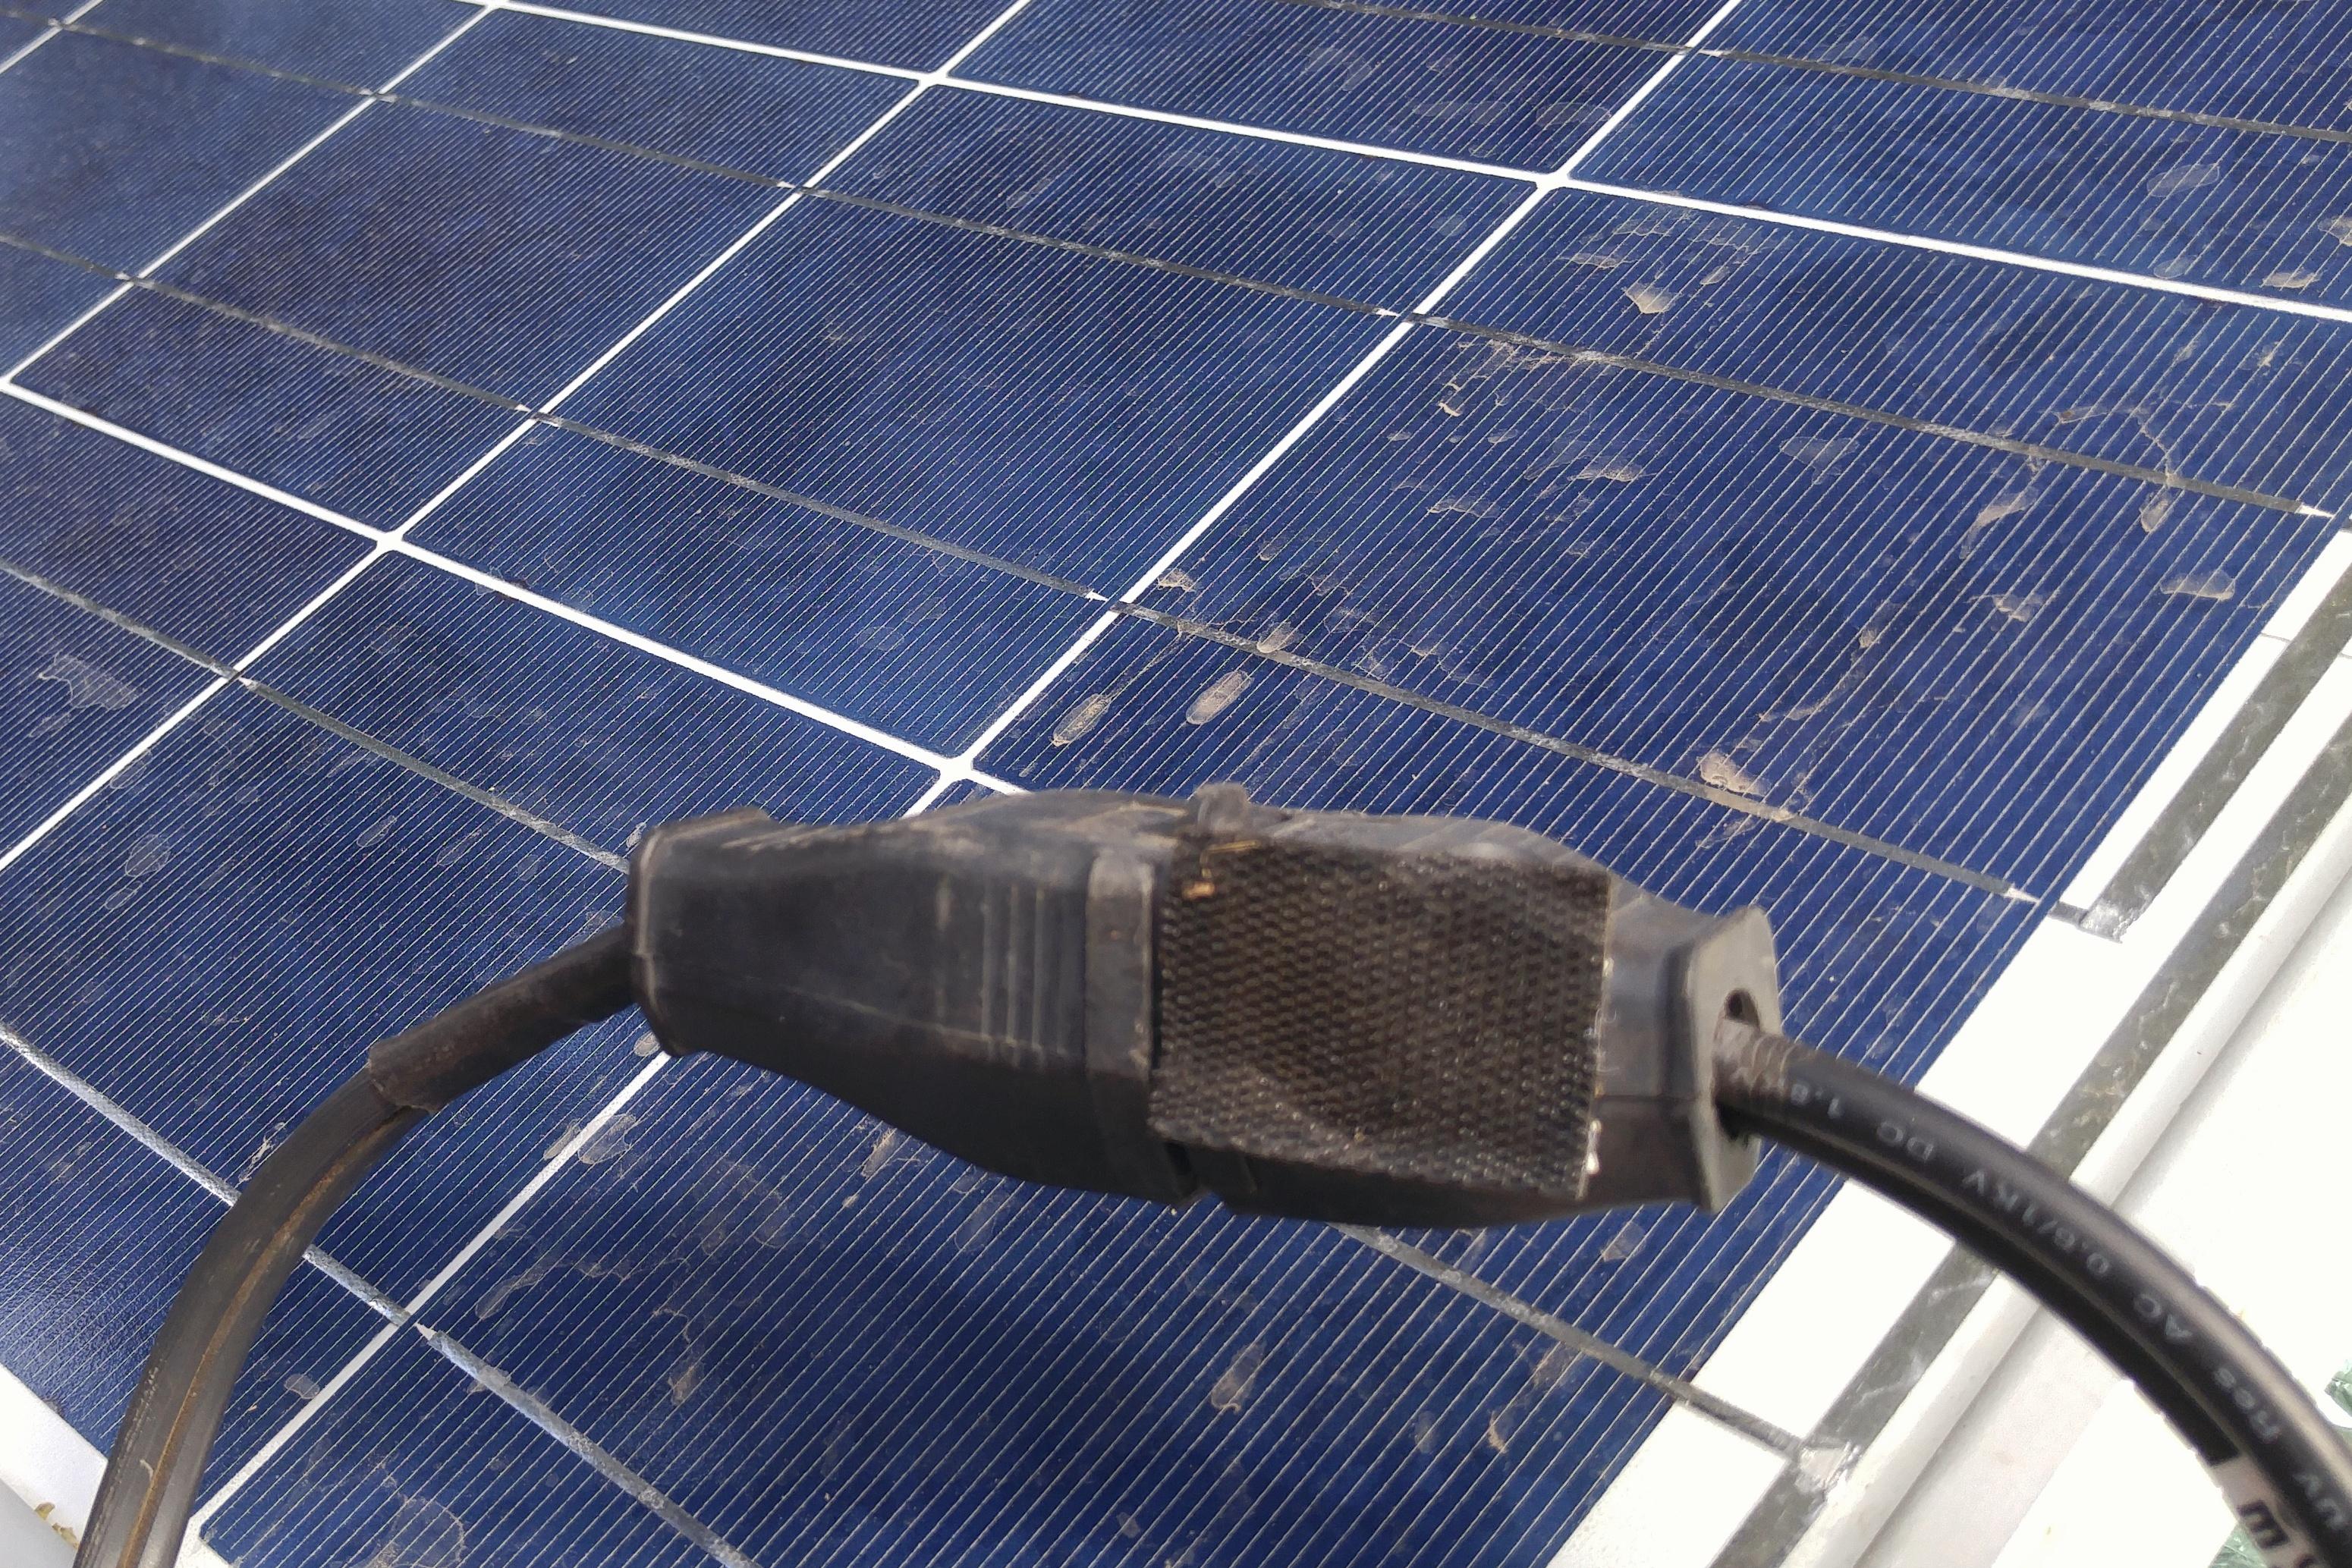 solarplug?w=575&h=383 dual battery solar system  at virtualis.co